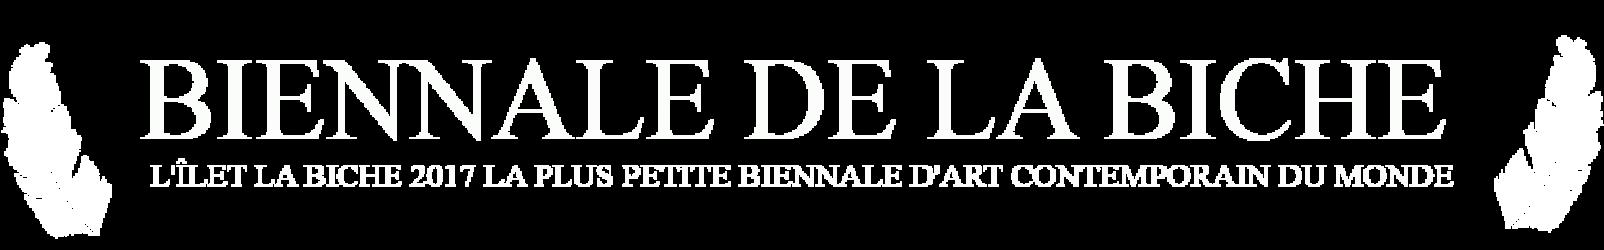 Biennale de La Biche